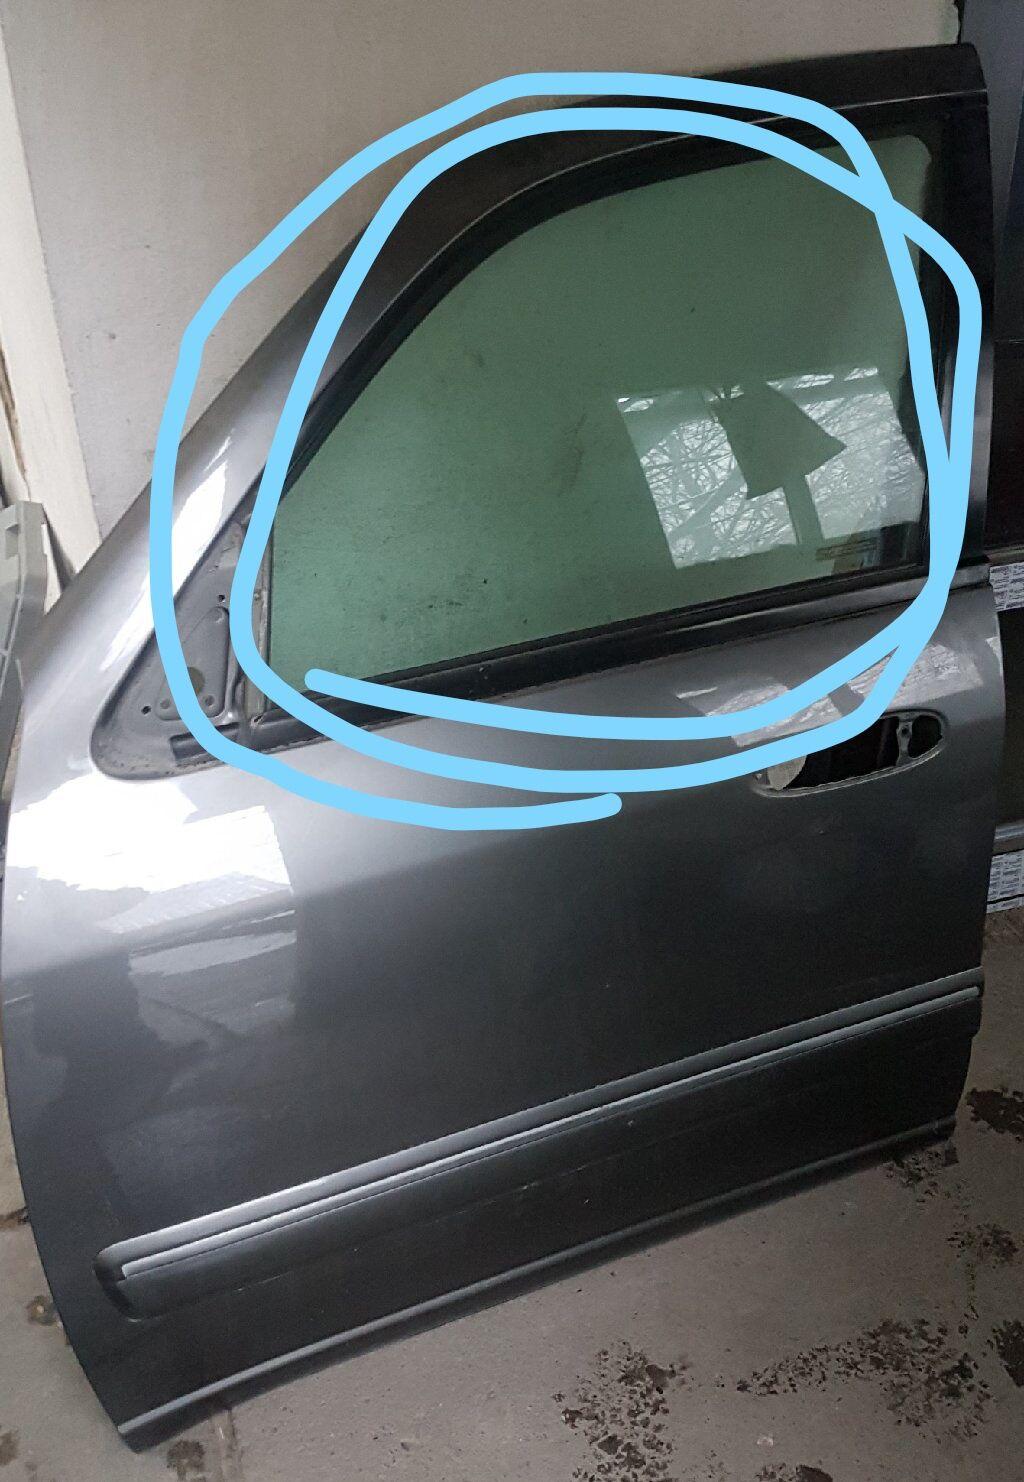 Toyota Sequoia Стекло дверное отпускное, Тойота Секвойя стекло: Toyota Sequoia Стекло дверное отпускное, Тойота Секвойя стекло